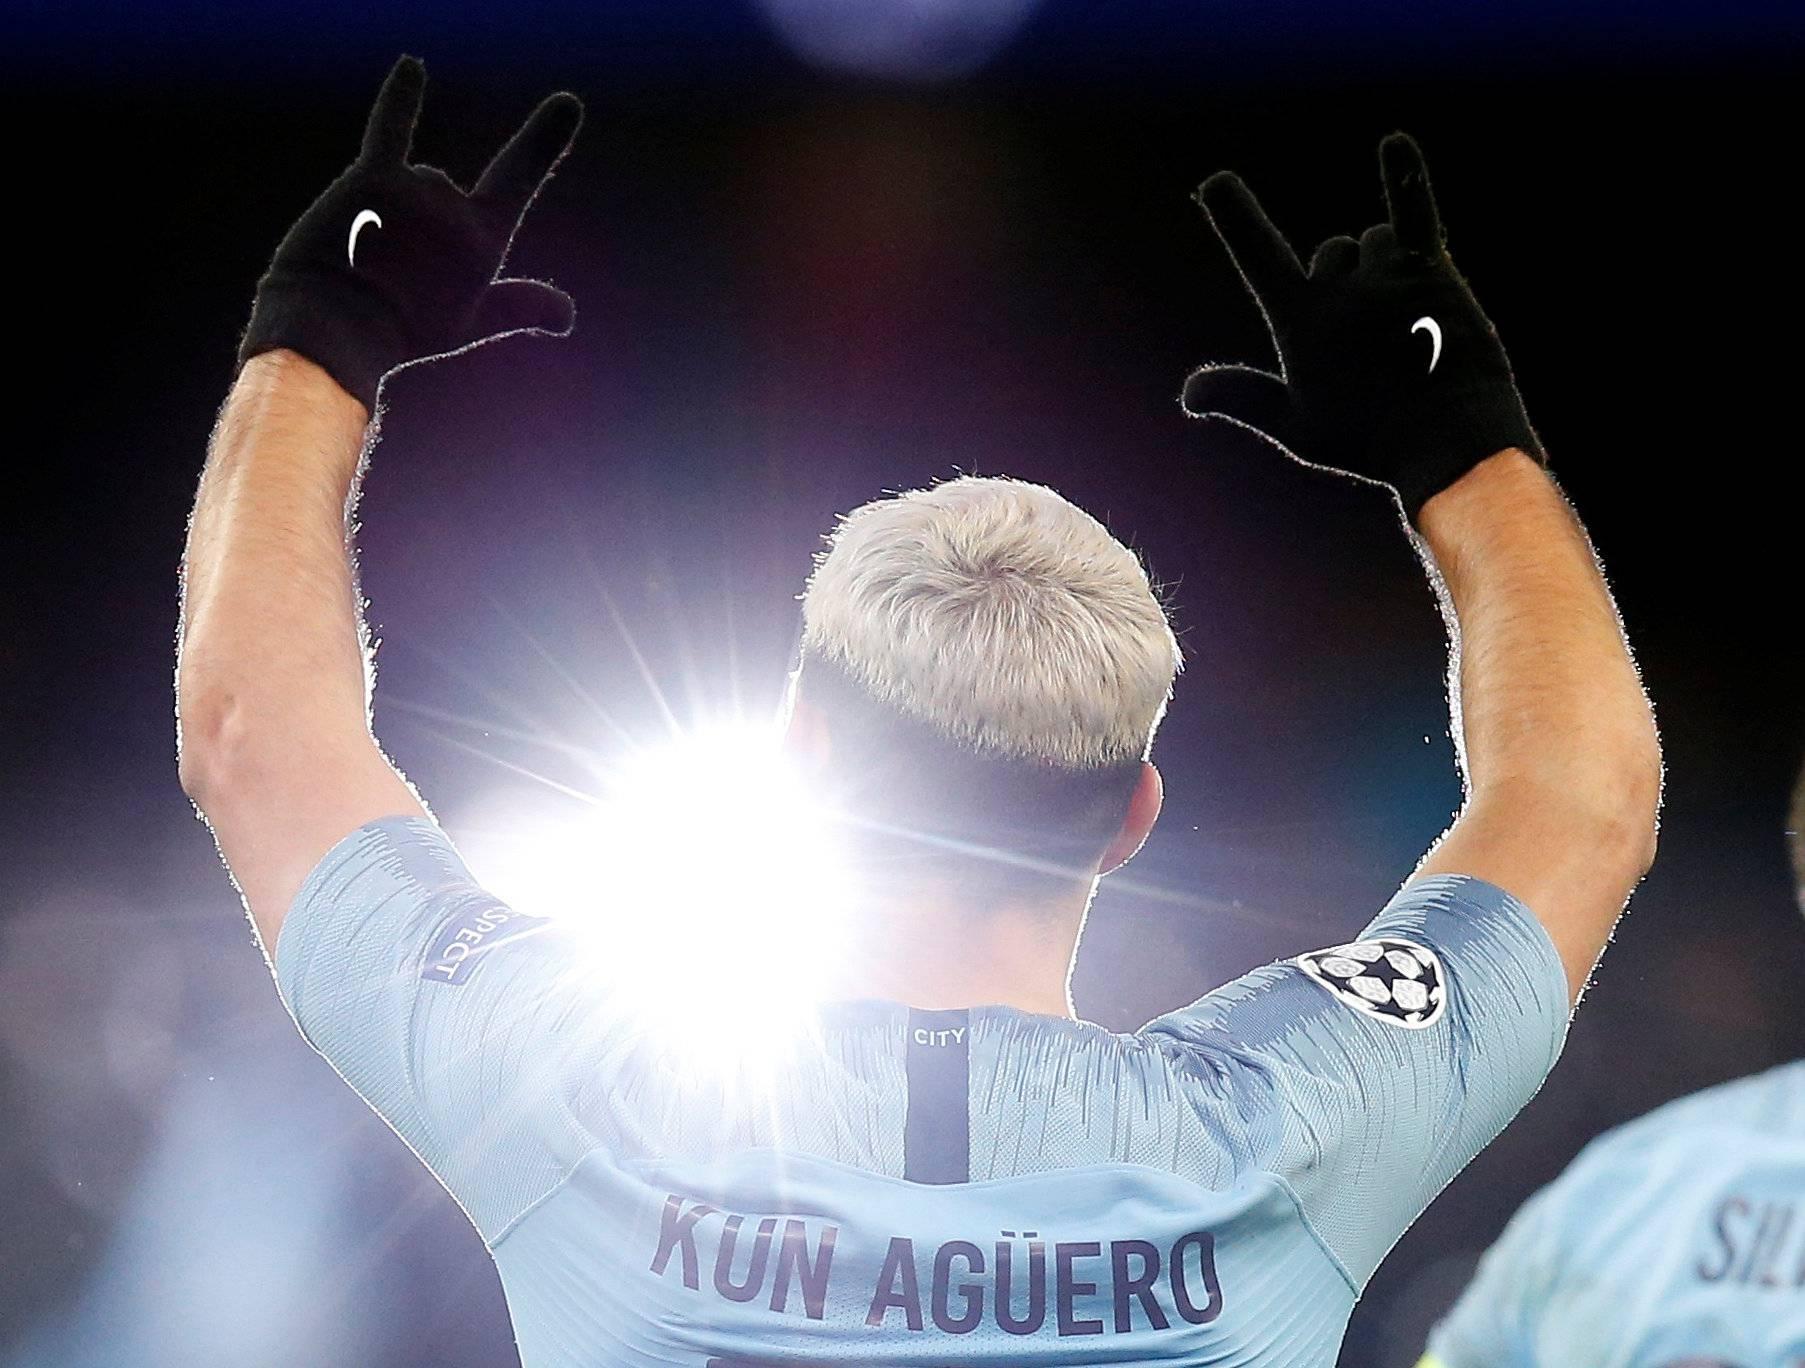 Champions League - Round of 16 Second Leg - Manchester City v Schalke 04